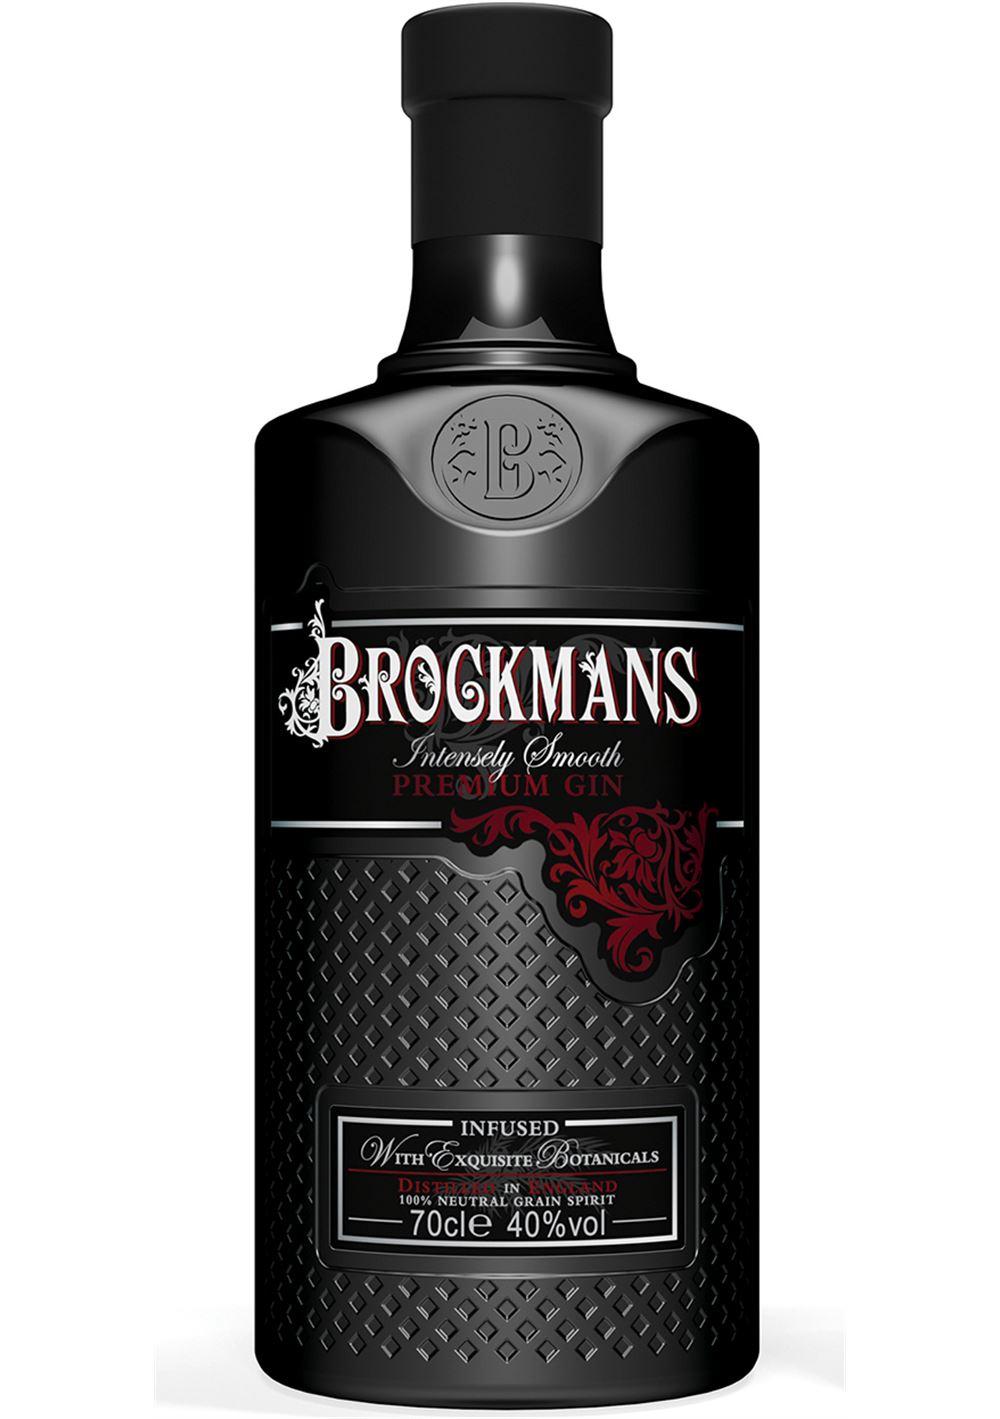 BROCKMAN